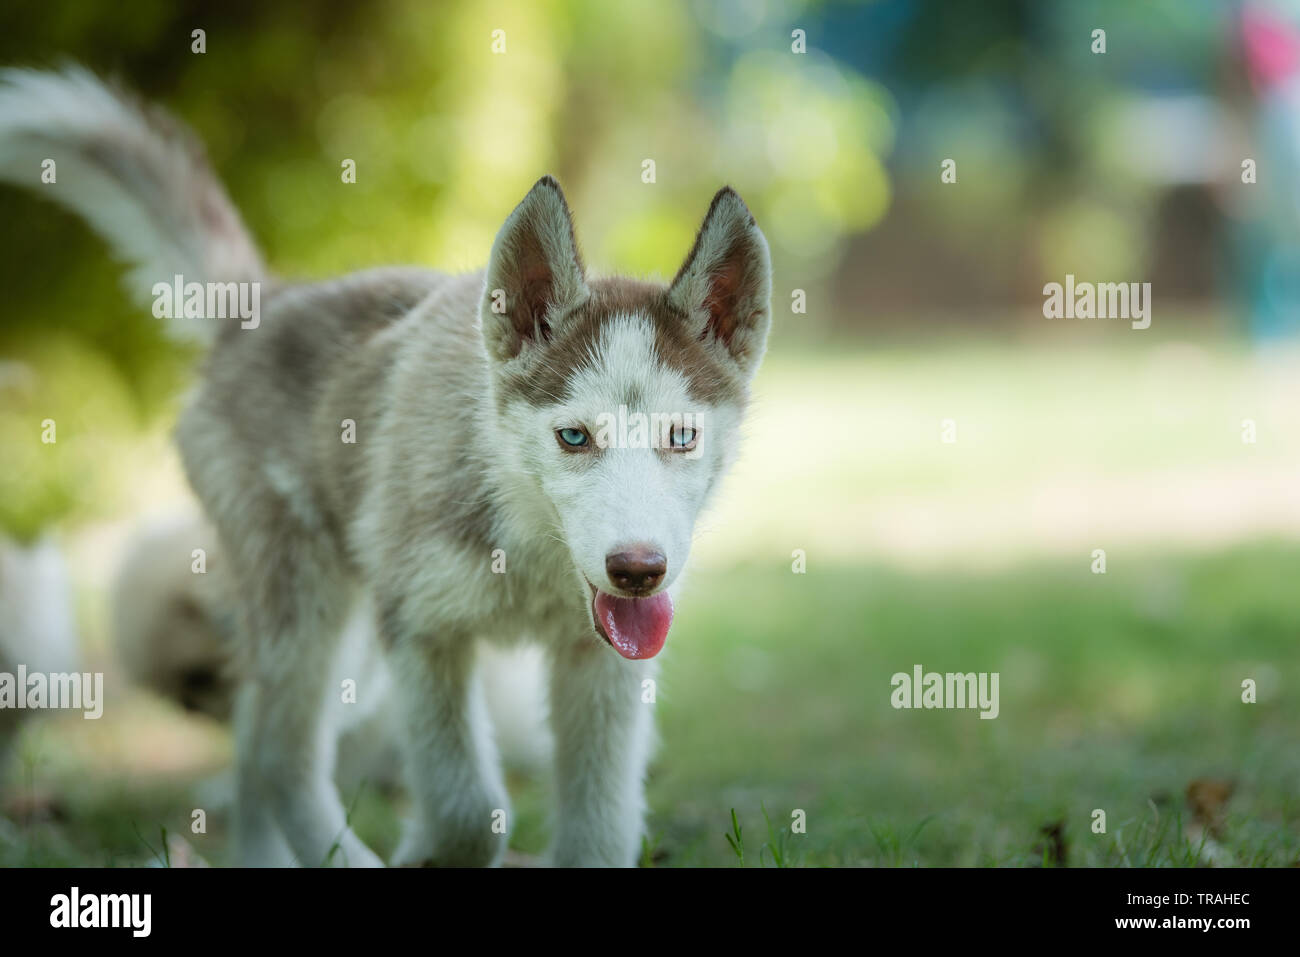 Cute Blue Eyed Siberian Husky Puppy Siberian Husky Puppy Approaching Forward Stock Photo Alamy